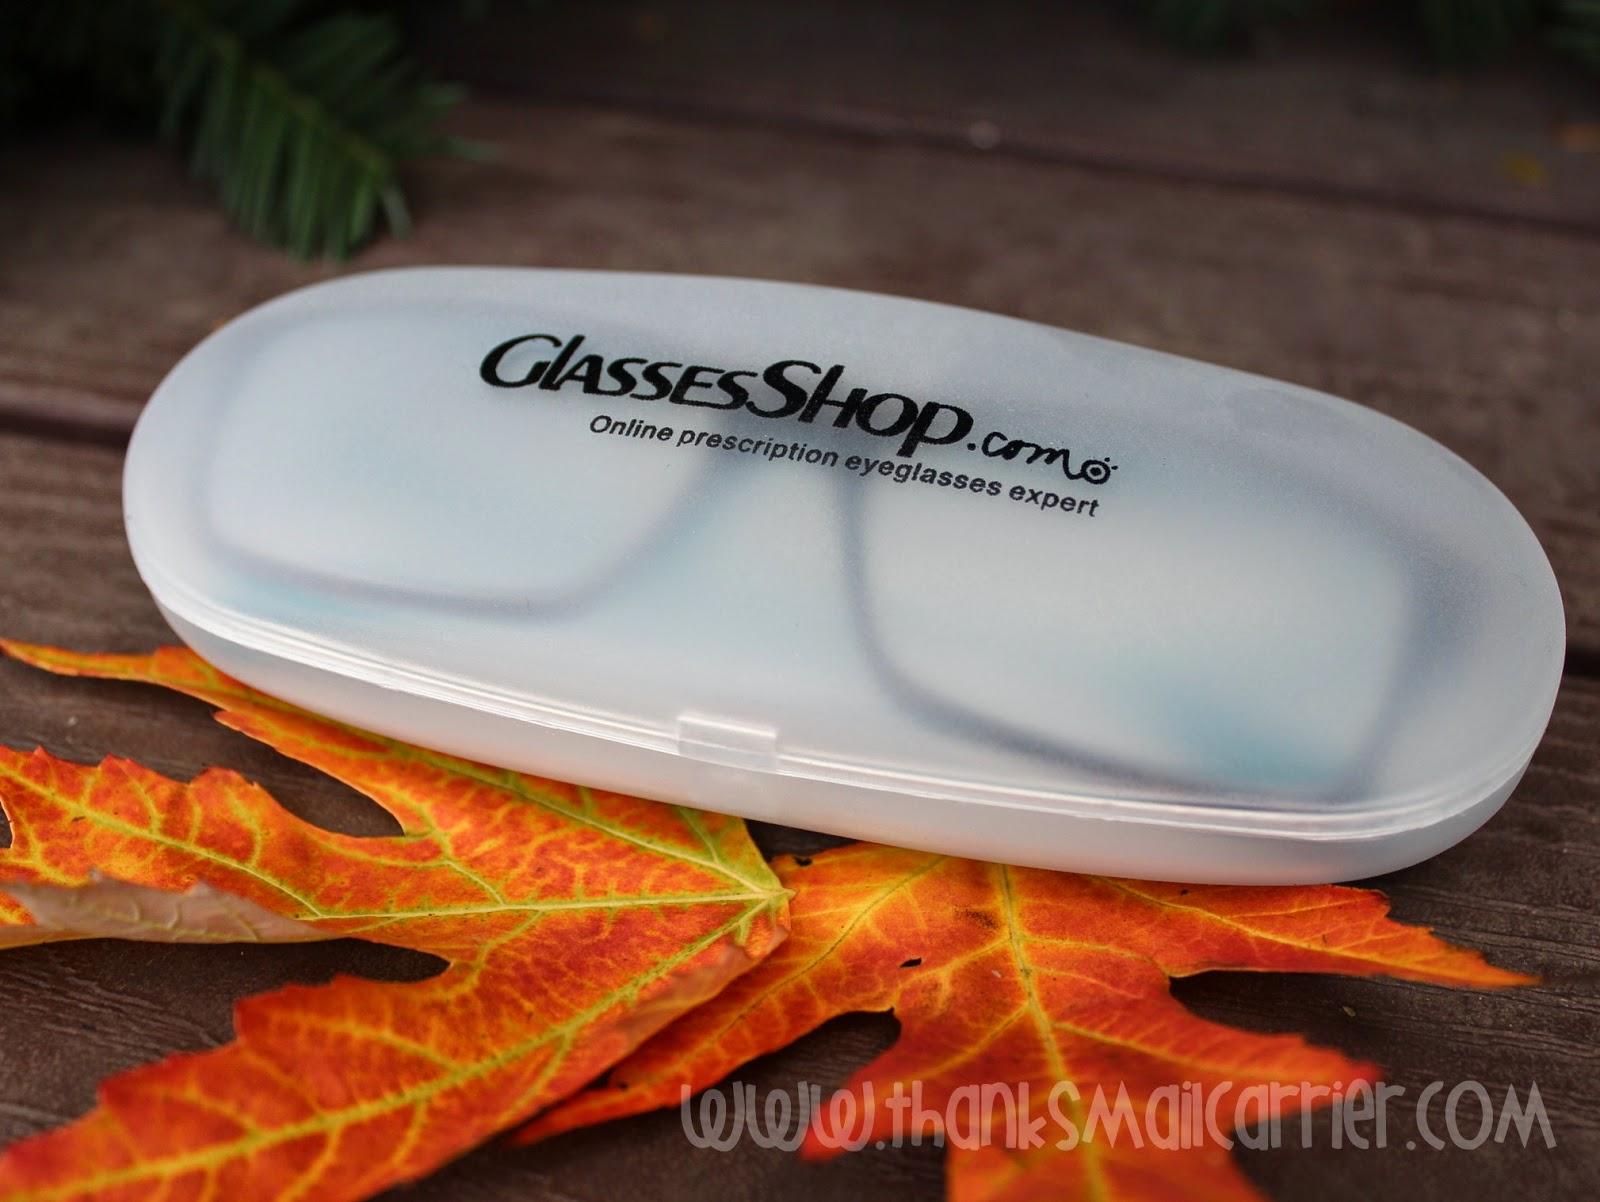 GlassesShop.com order